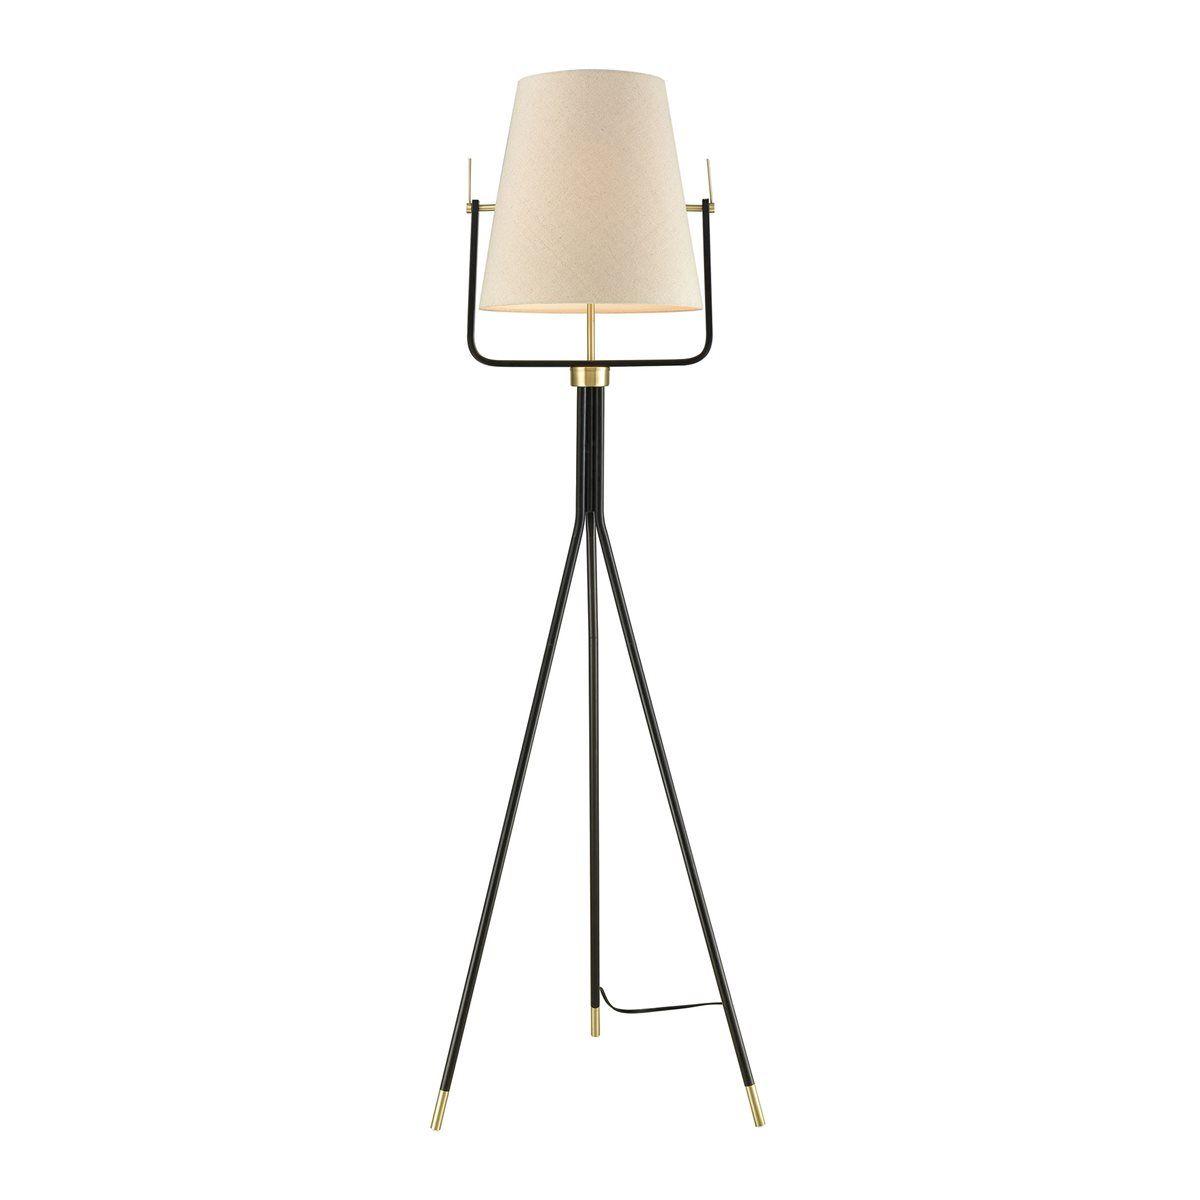 CROMWELL FLOOR LAMP